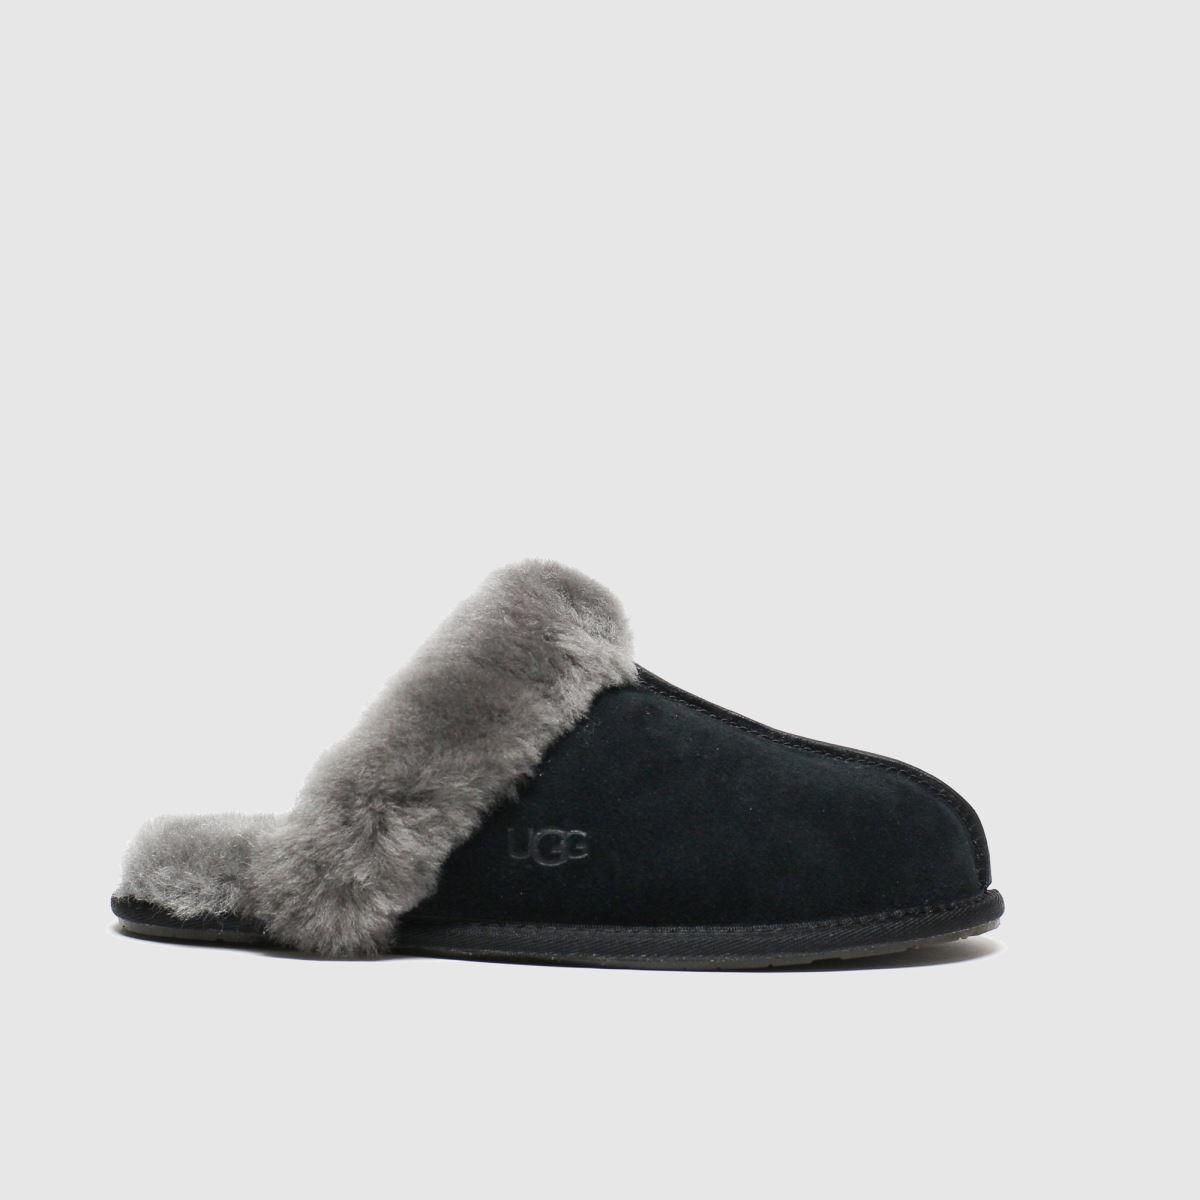 UGG Black & Grey Scuffette Slippers